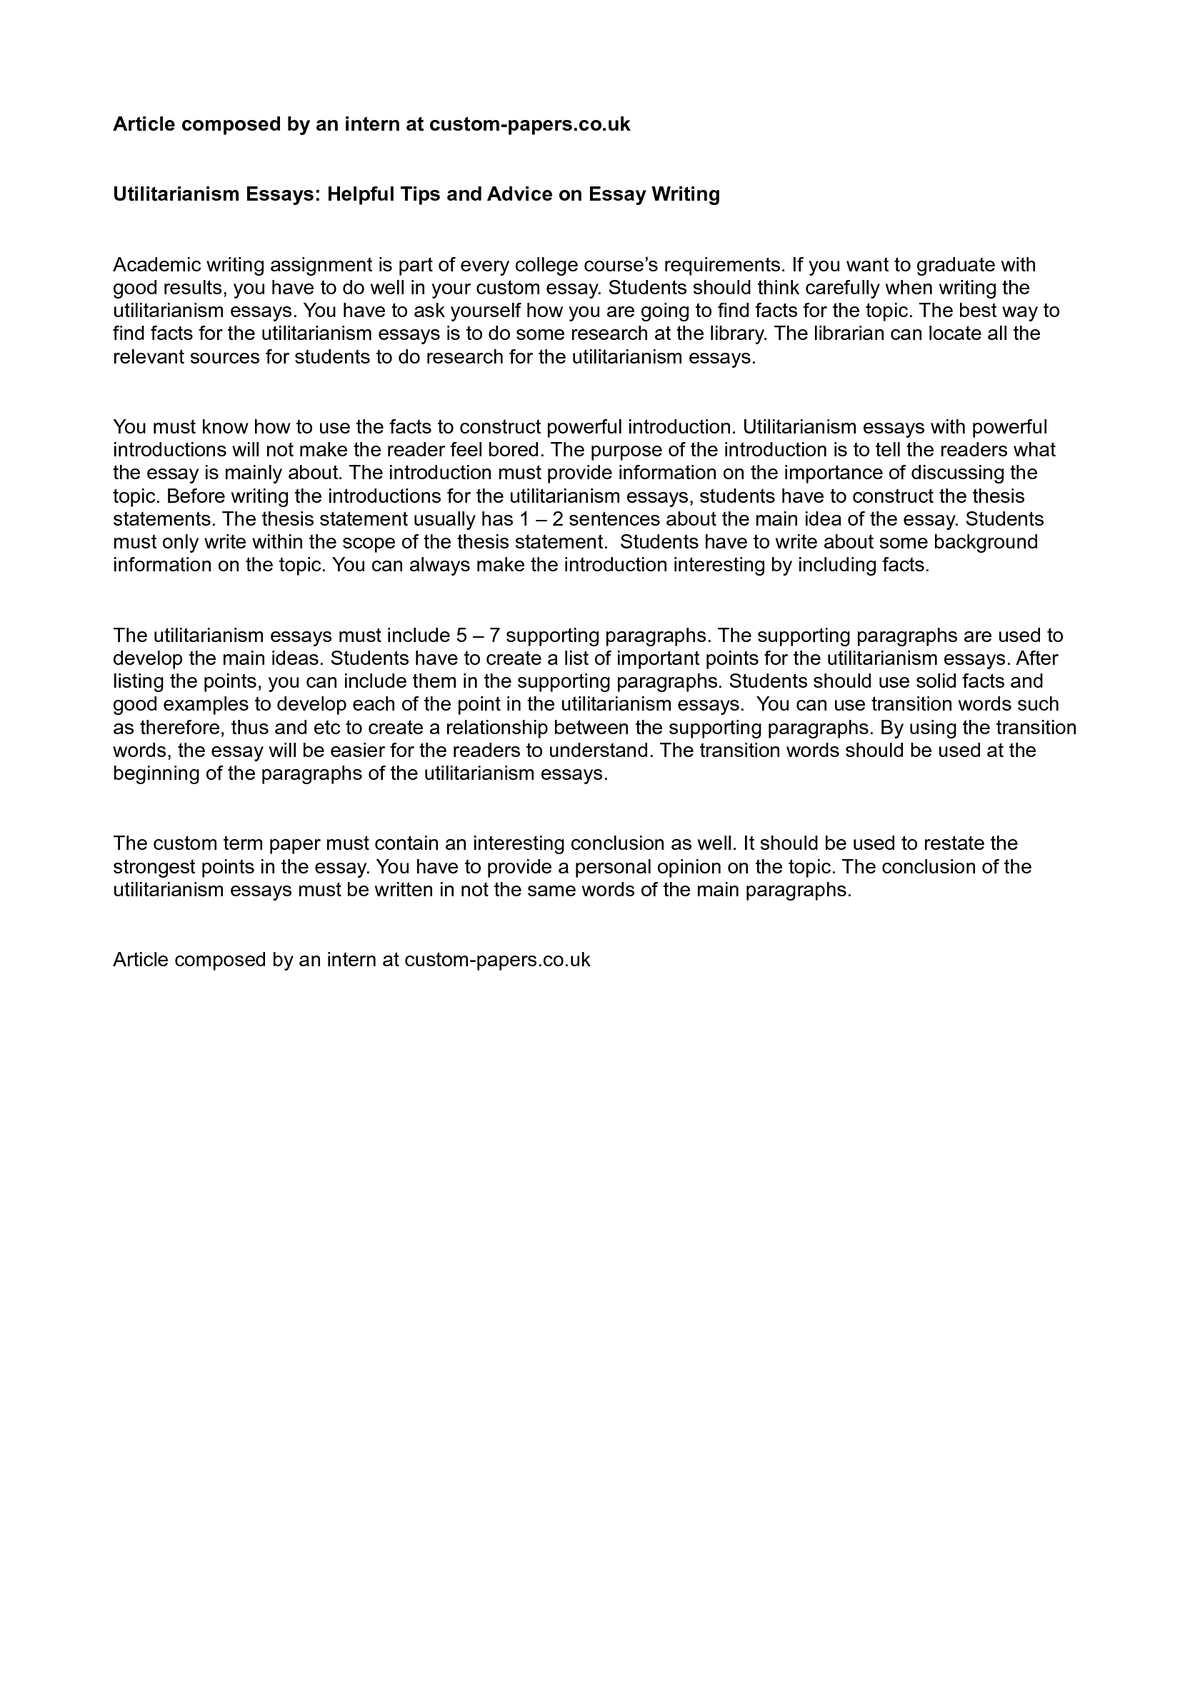 Health Essay Writing Calamo  Utilitarianism Essays Helpful Tips And Advice On Essay Writing Persuasive Essay Sample High School also Sample Essay Thesis Statement Calamo  Utilitarianism Essays Helpful Tips And Advice On Essay  Health Essay Sample